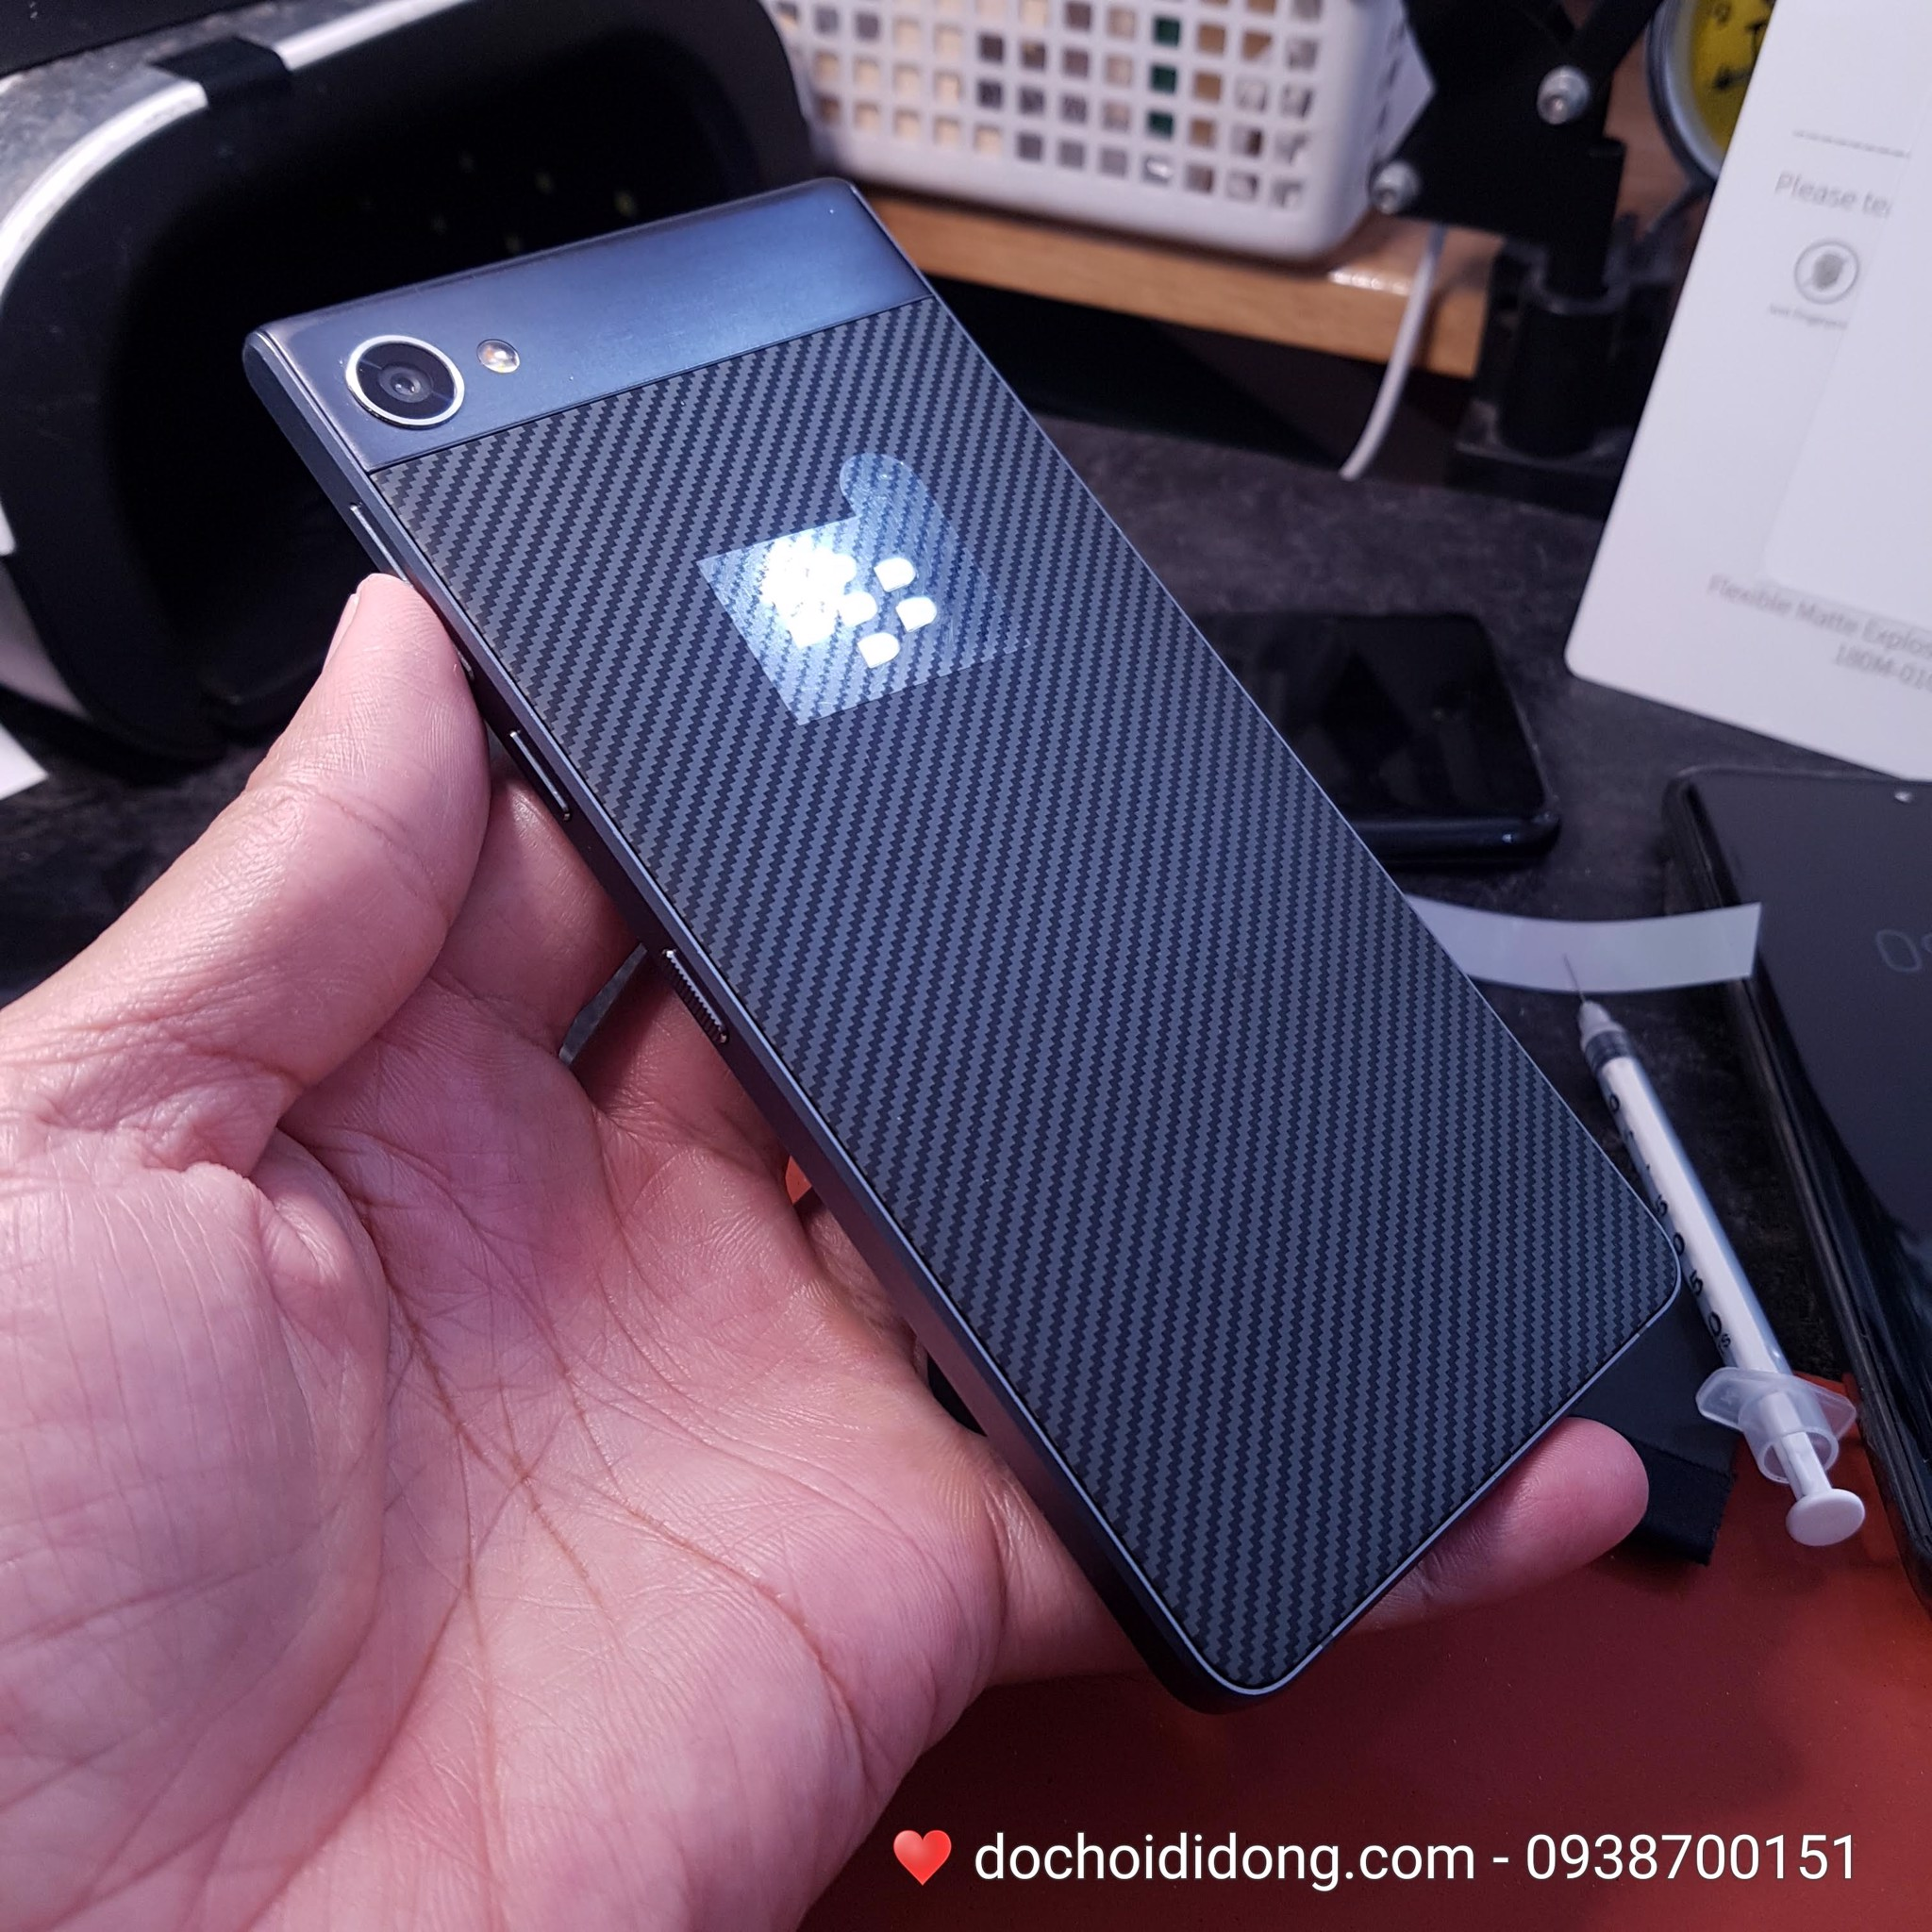 mieng-dan-ppf-rock-blackberry-motion-trong-nham-doi-mau-cao-cap